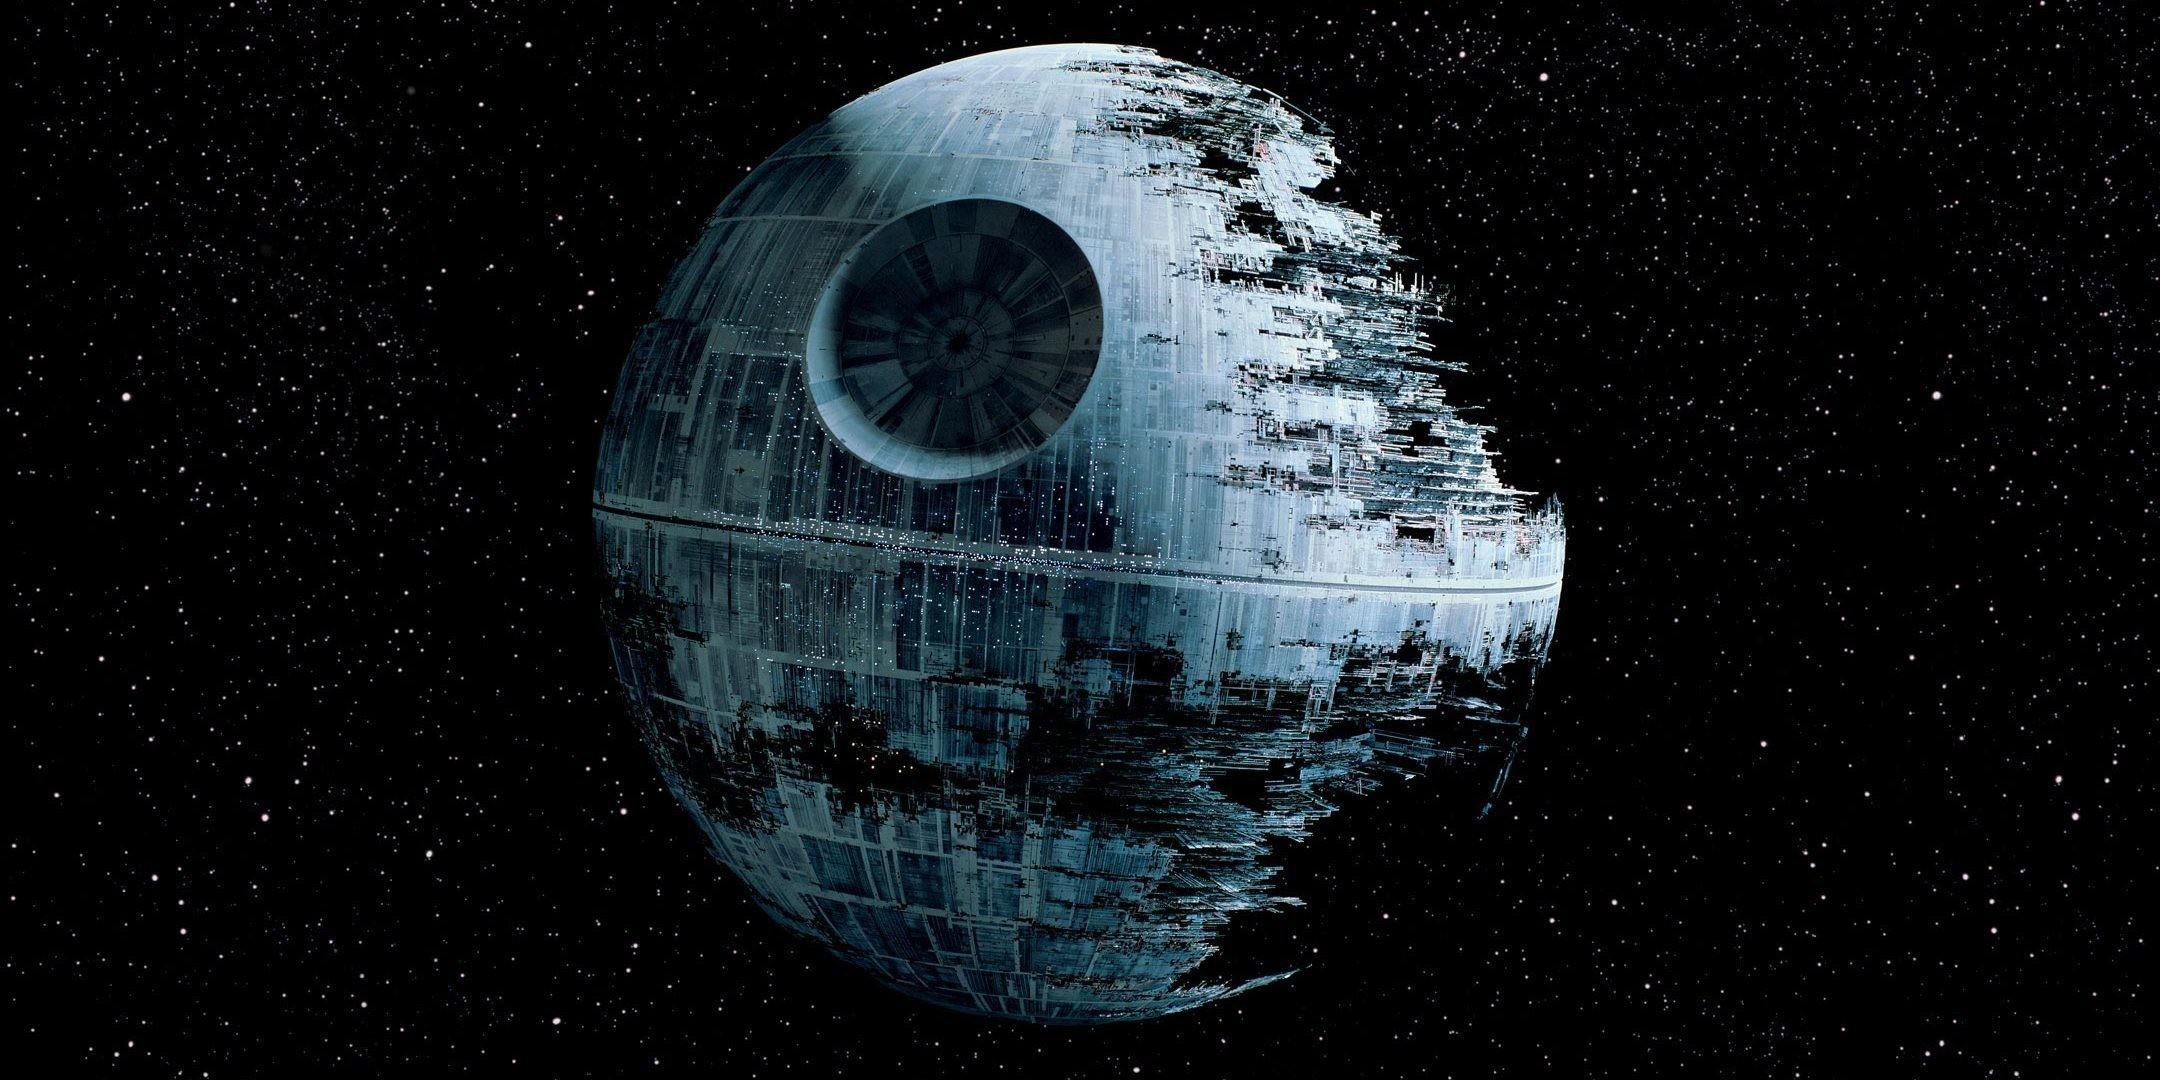 Death Star Hangar Wallpaper (64+ images)